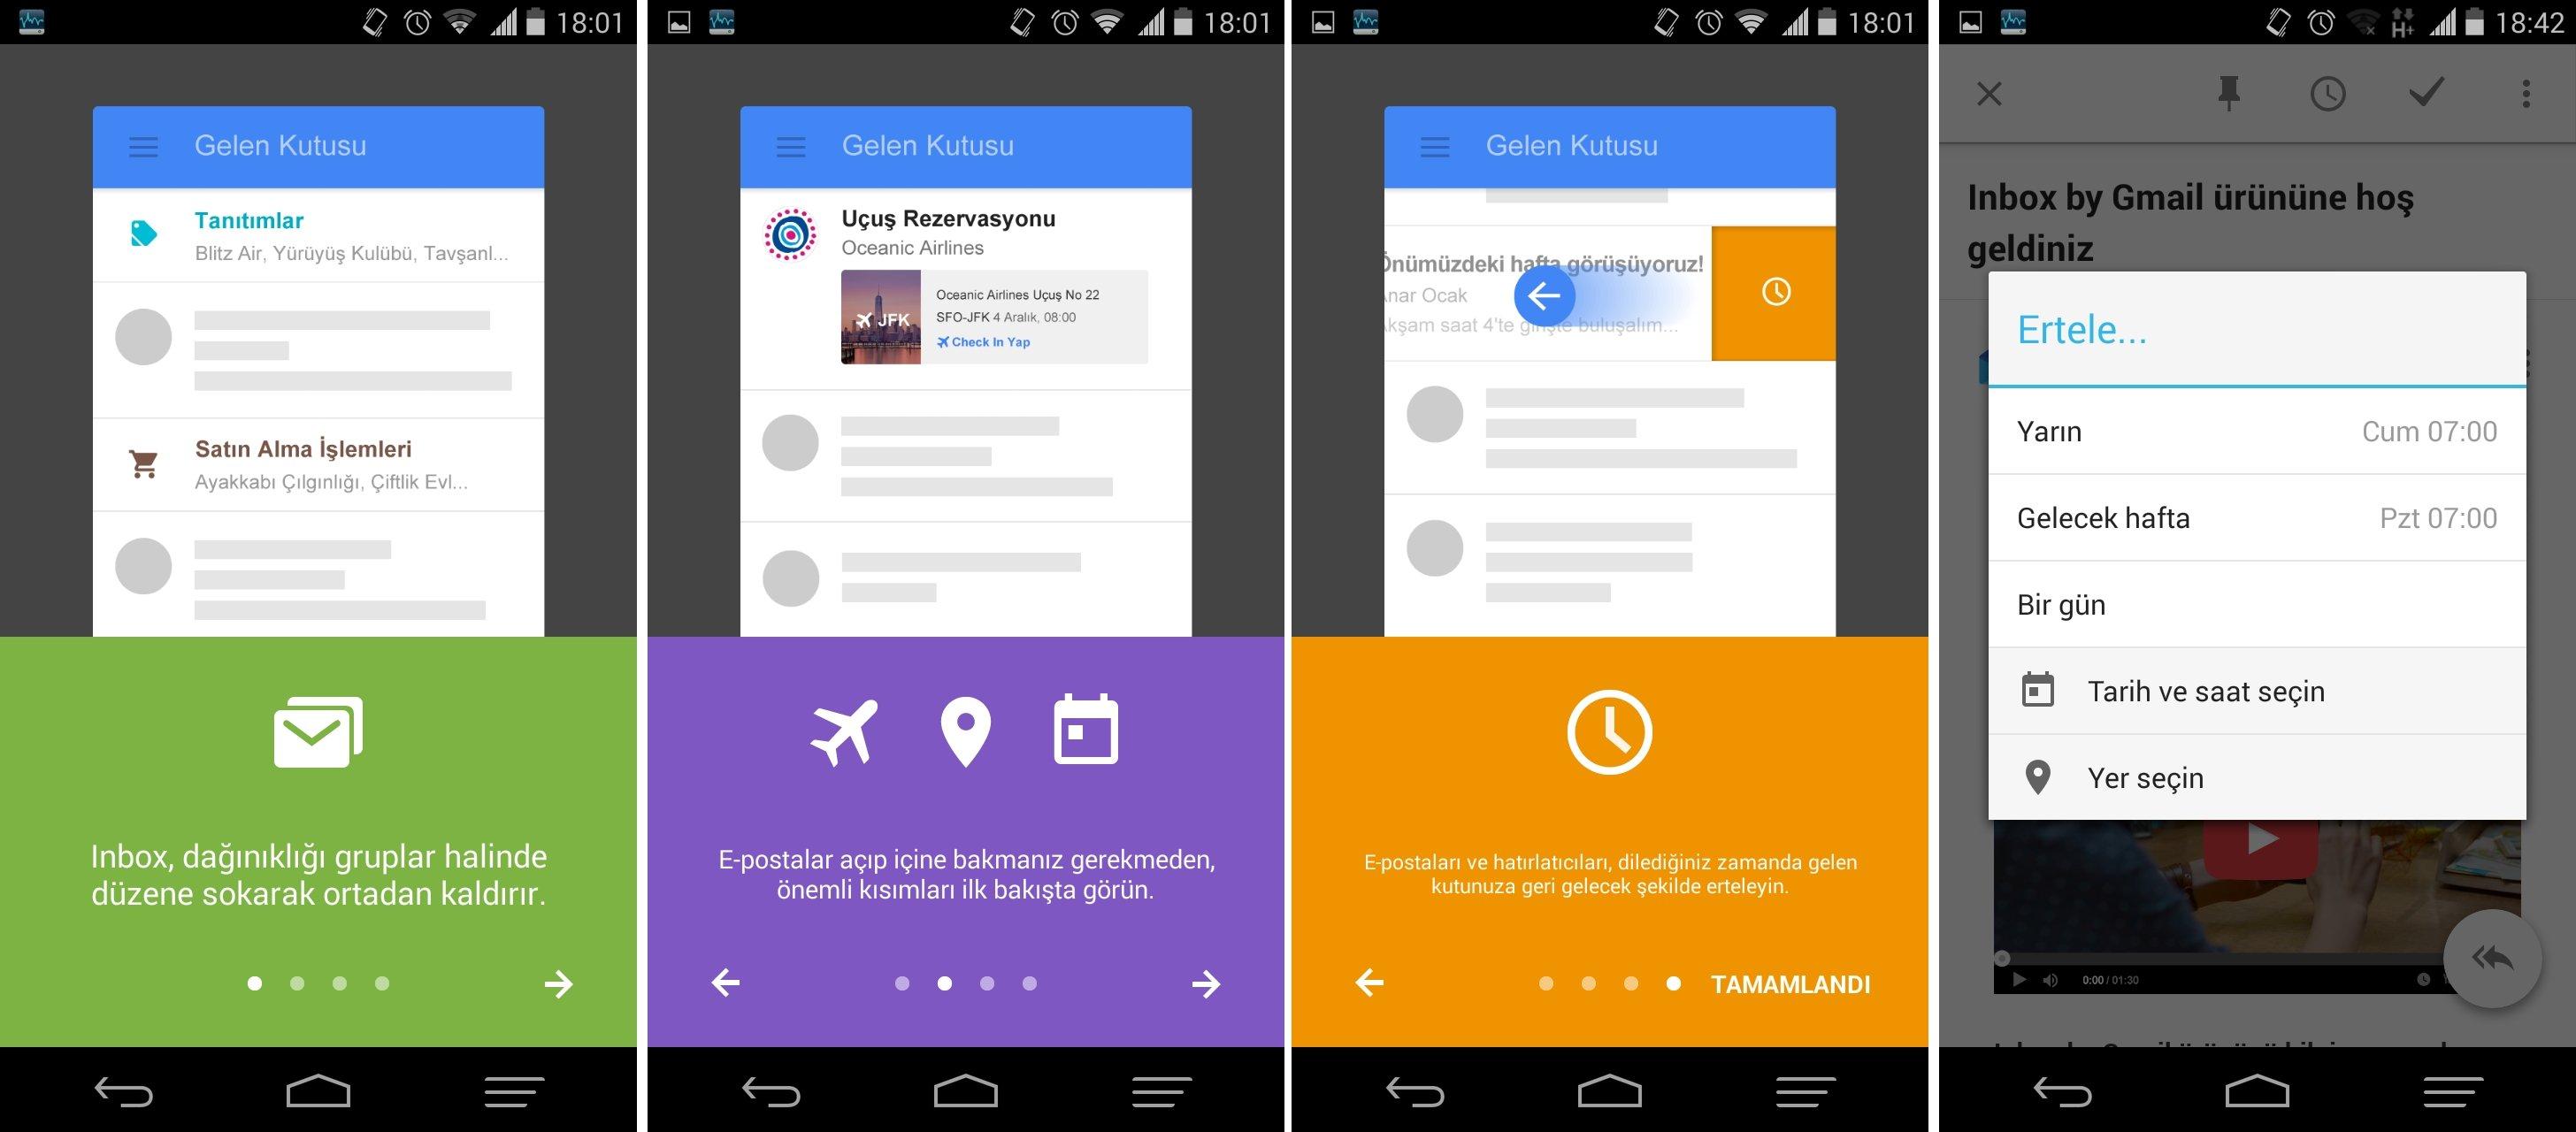 google inbox eposta gmail mobil 2